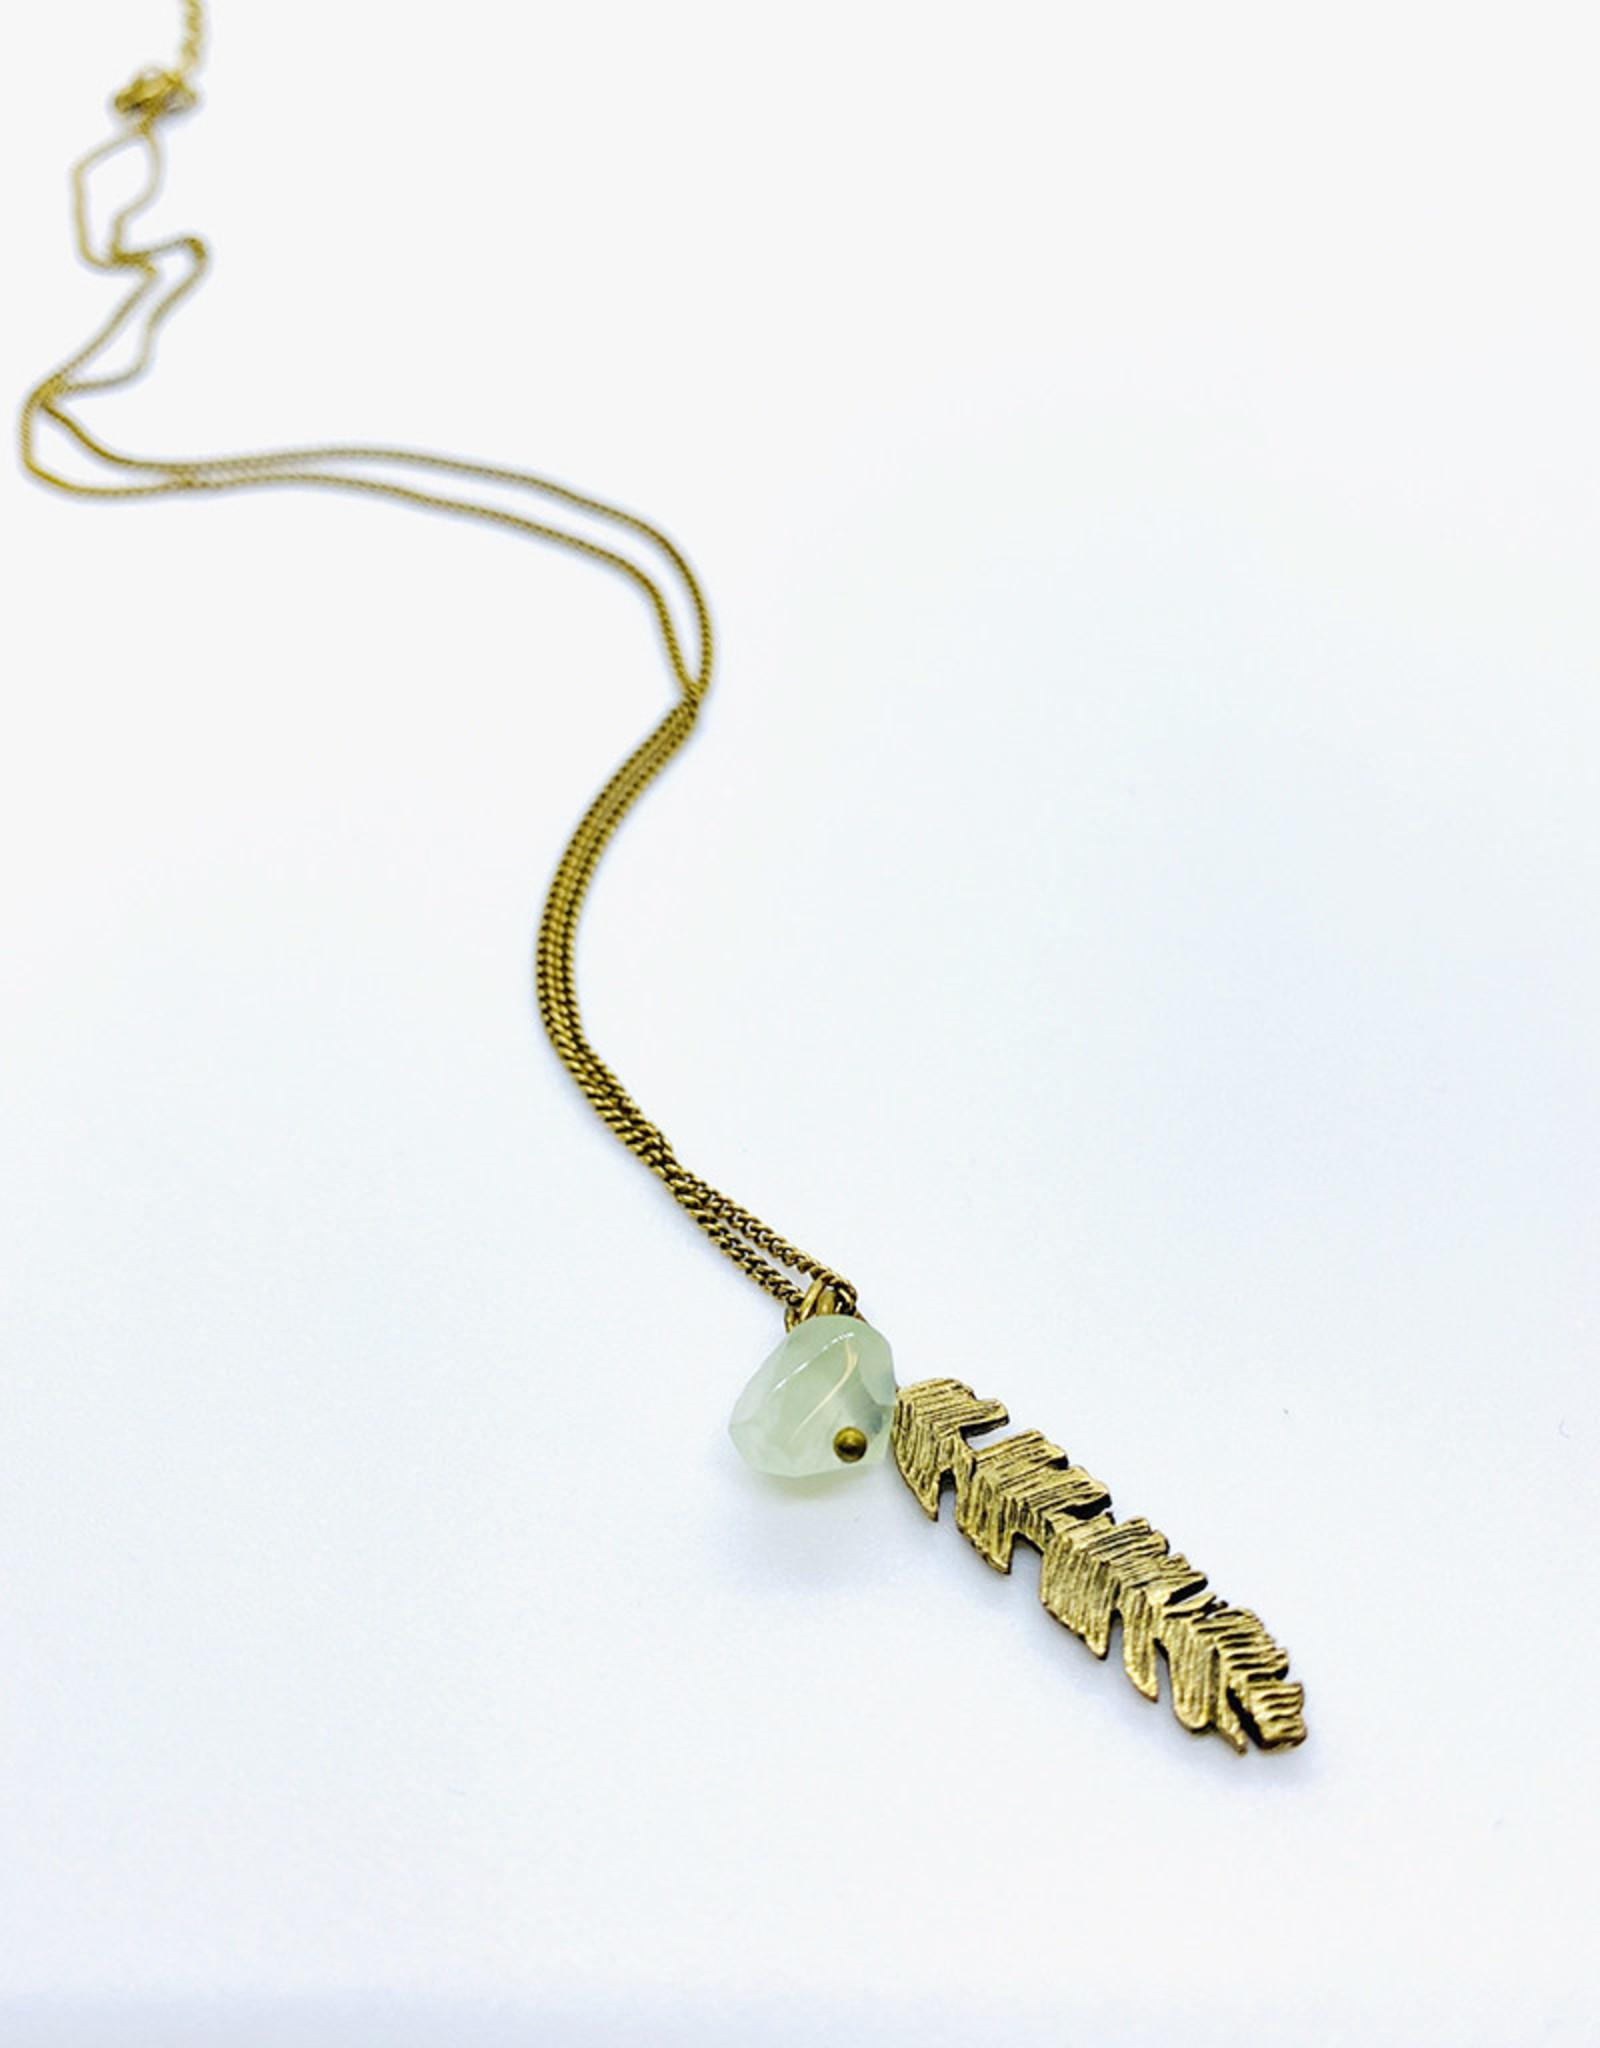 Tilly Doro Feather + Green Amethyst Necklace // Tillydoro